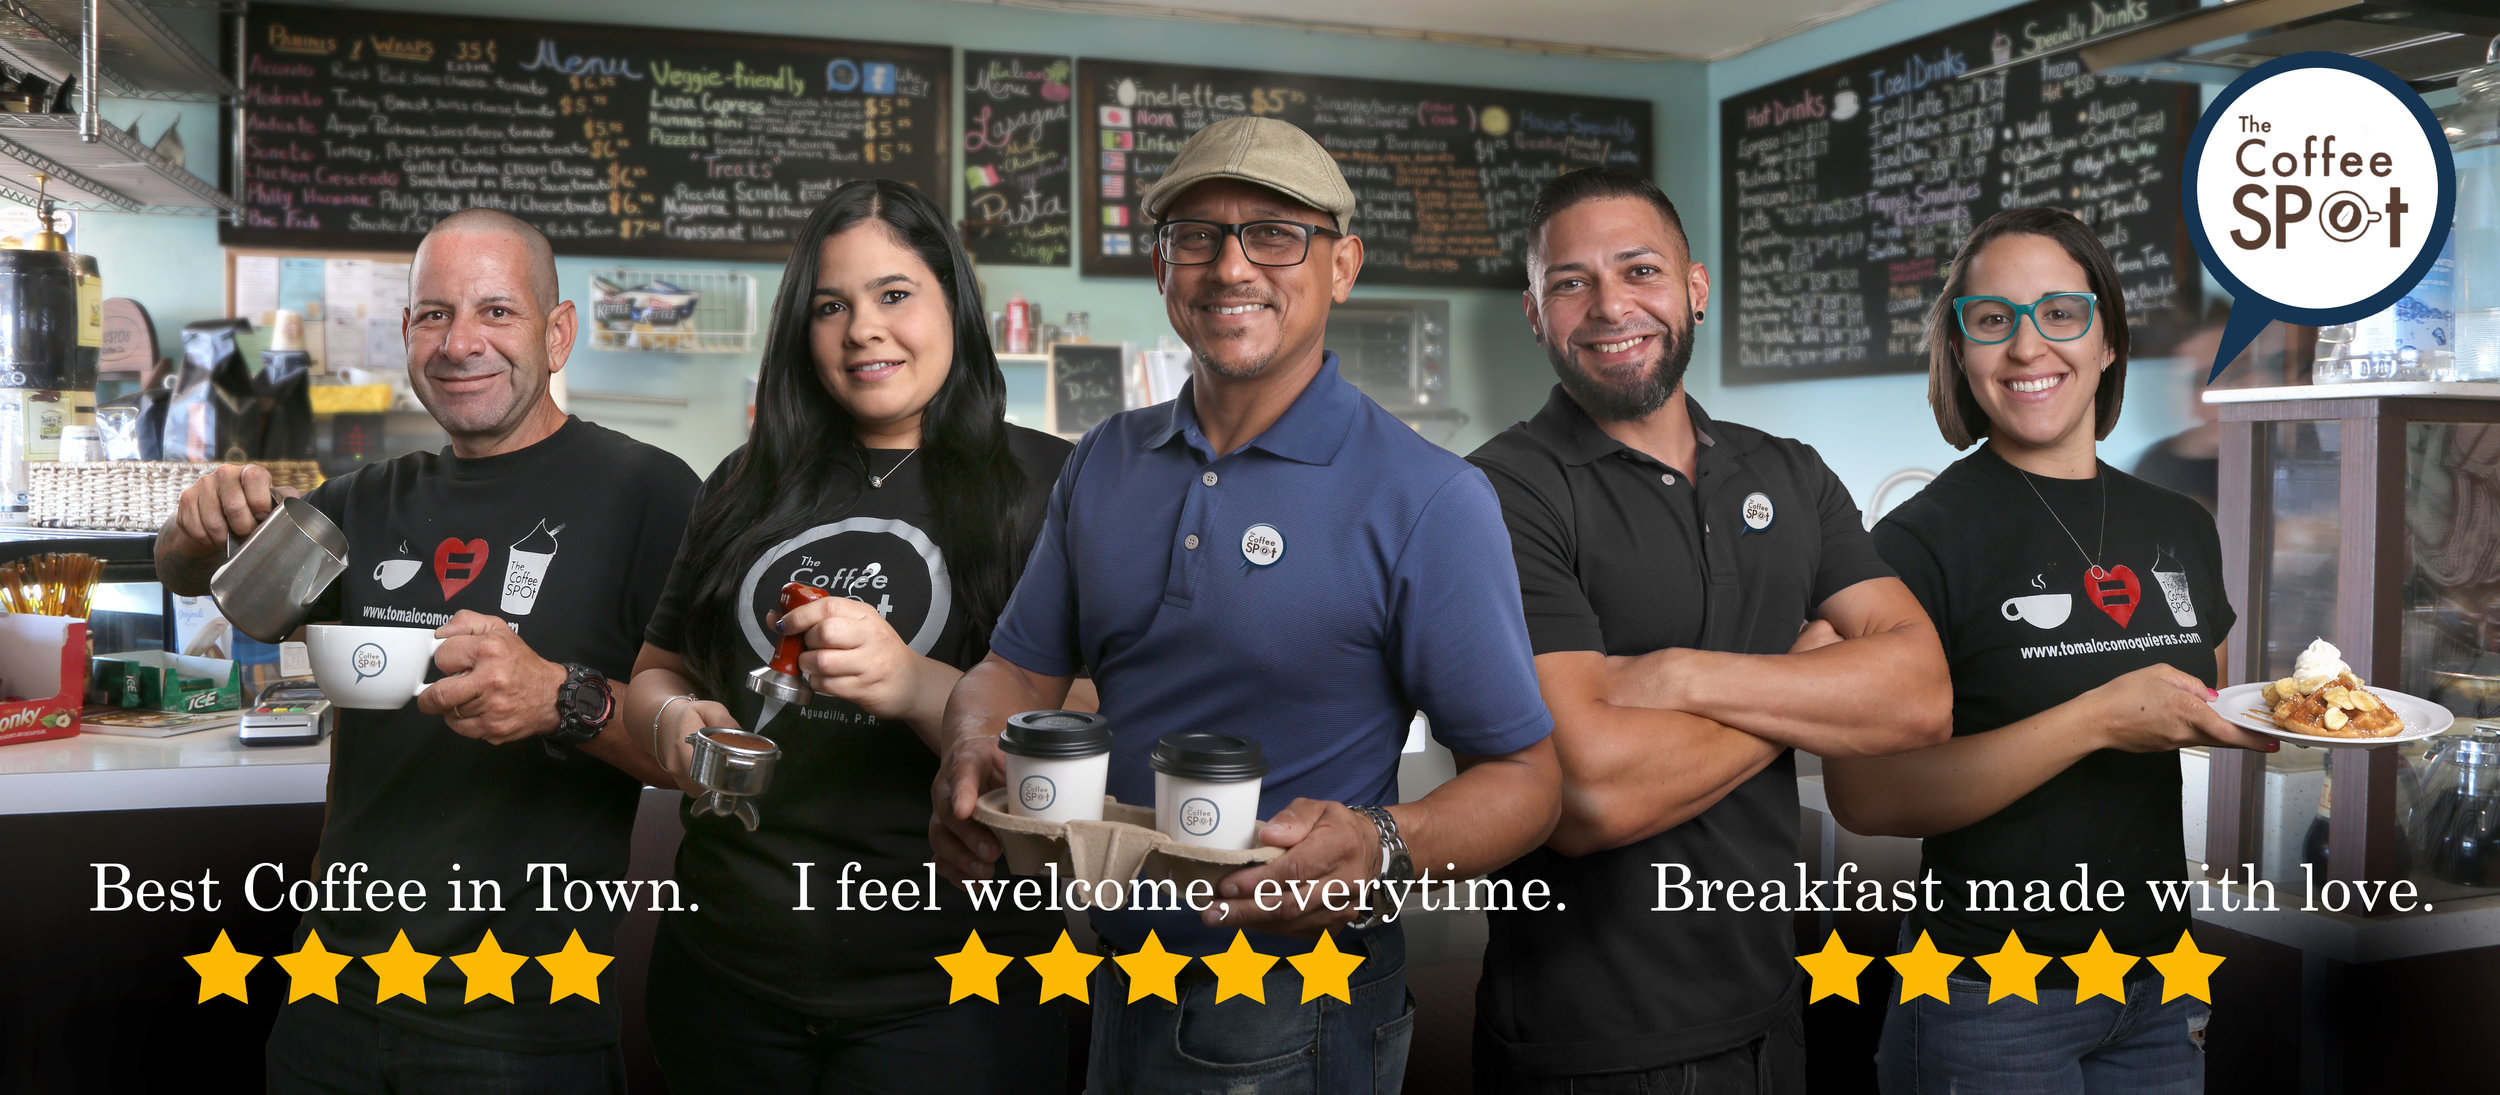 Coffee Spot Team2.jpg